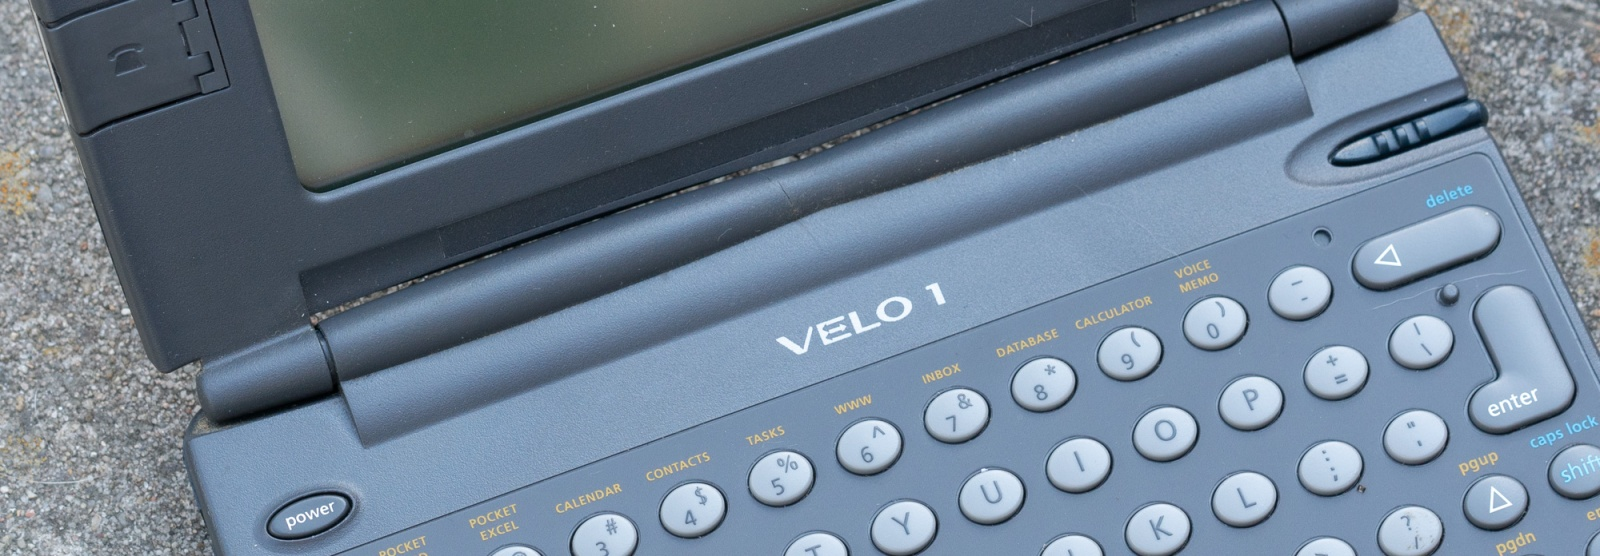 Древности: Philips Velo 1, ночной кошмар энтузиаста технологий - 1